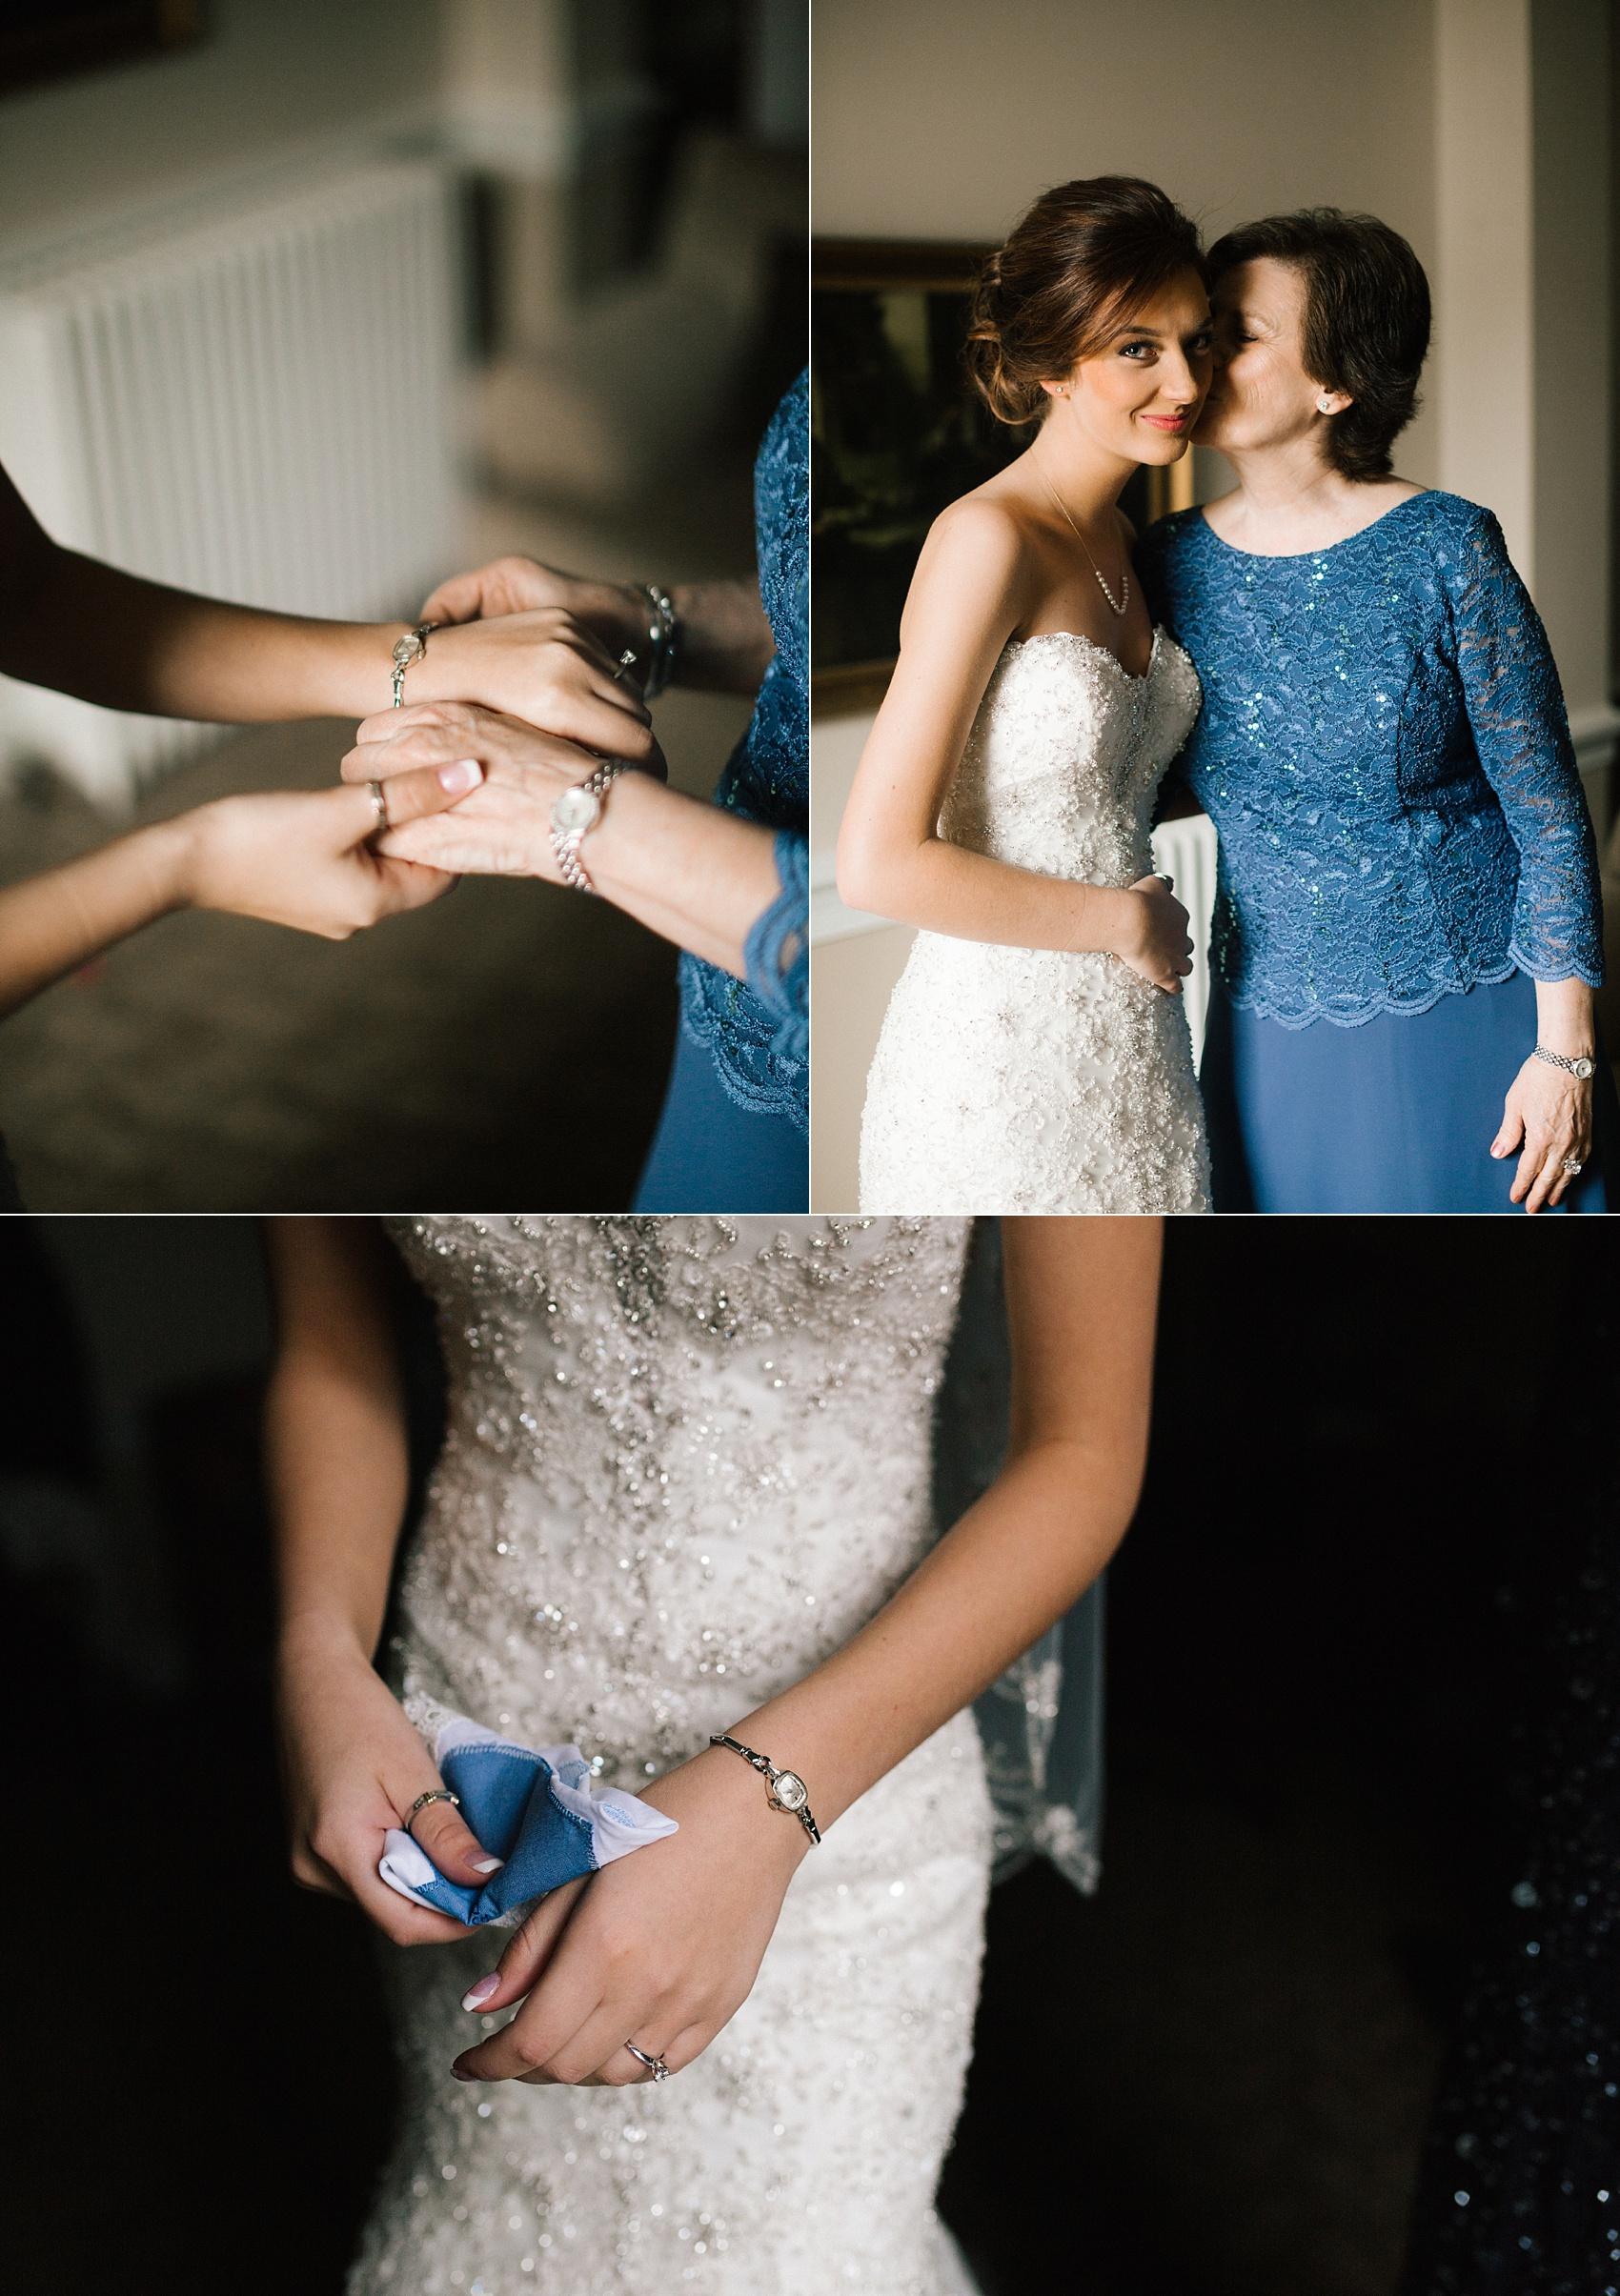 dwayne lydia delaware wedding philadelphia baltimore washingtion dc wedding photographer-9